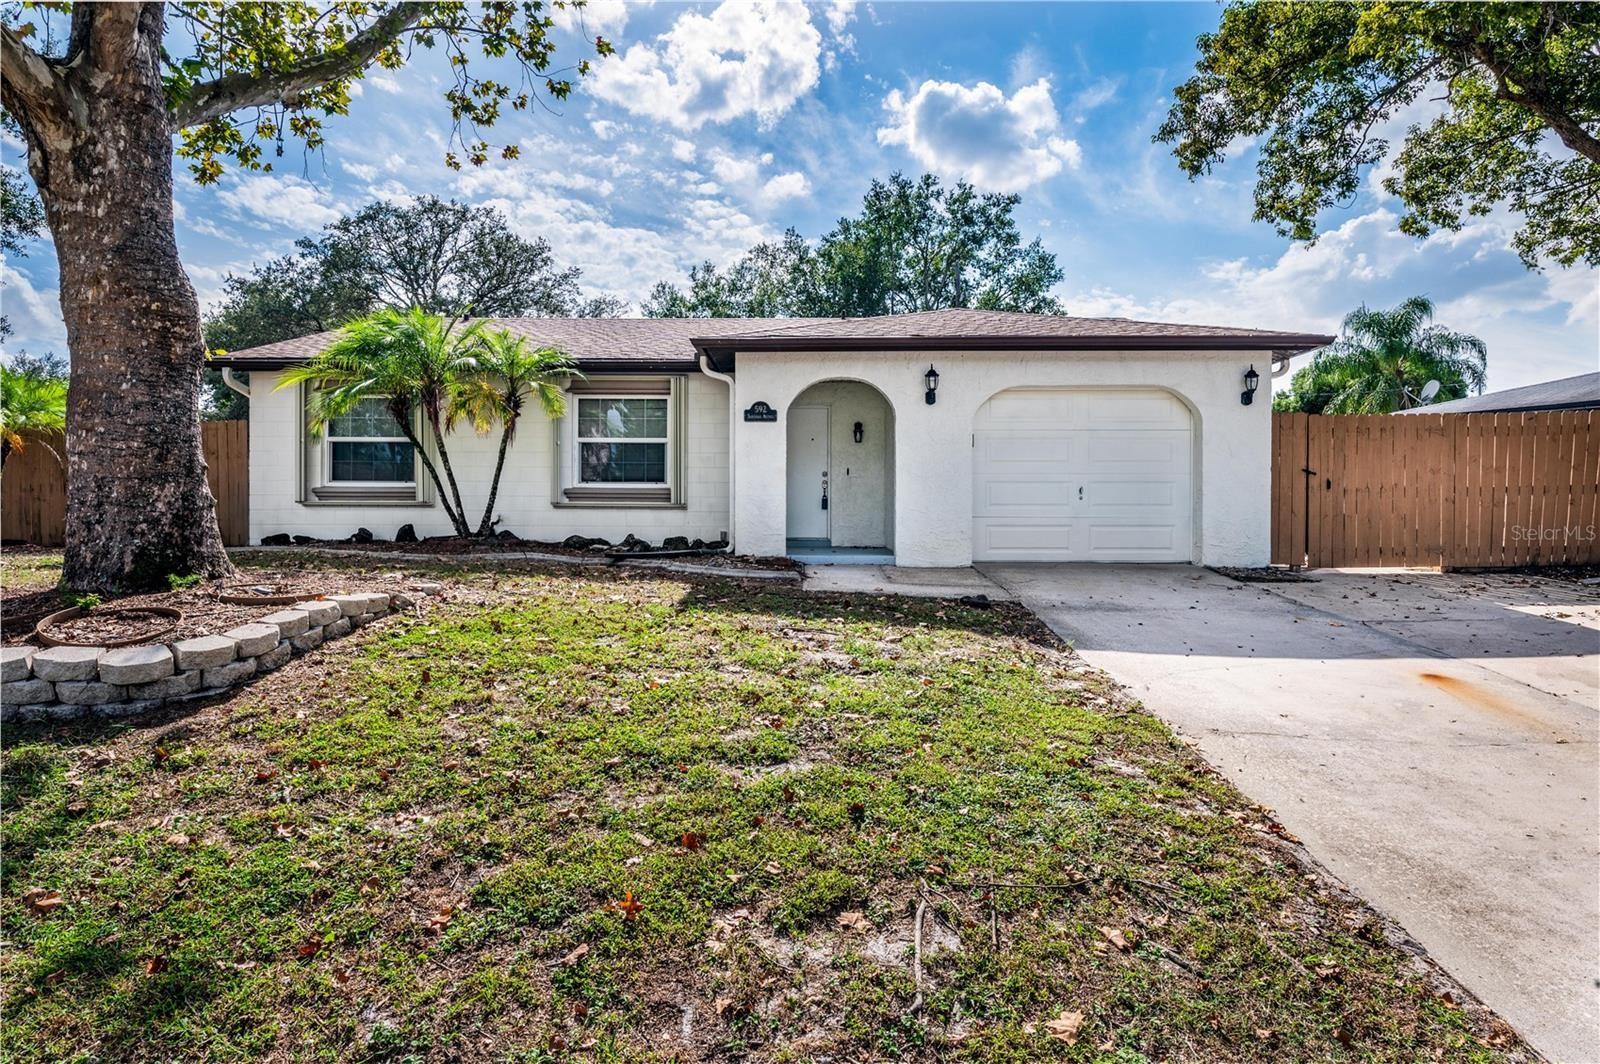 592 SANTIAGO AVENUE, Orlando, FL 32807 - #: O5978818